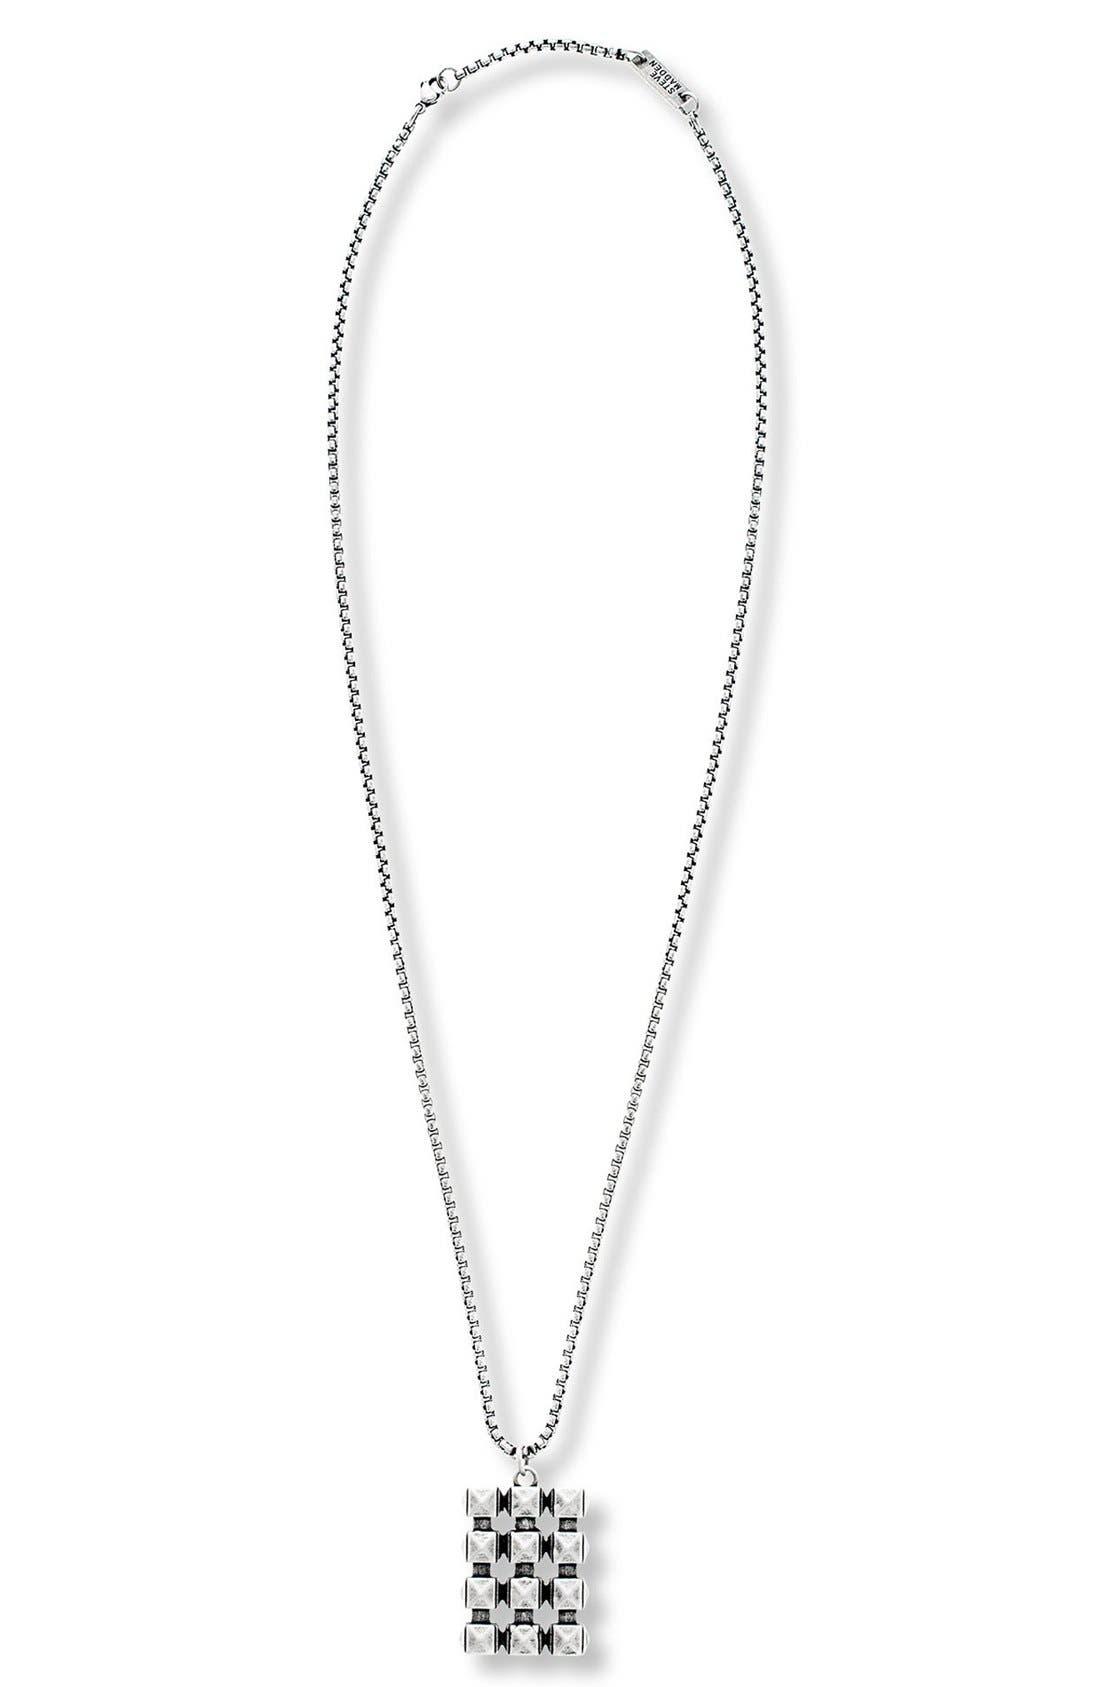 Main Image - Steve Madden Studded Pendant Necklace